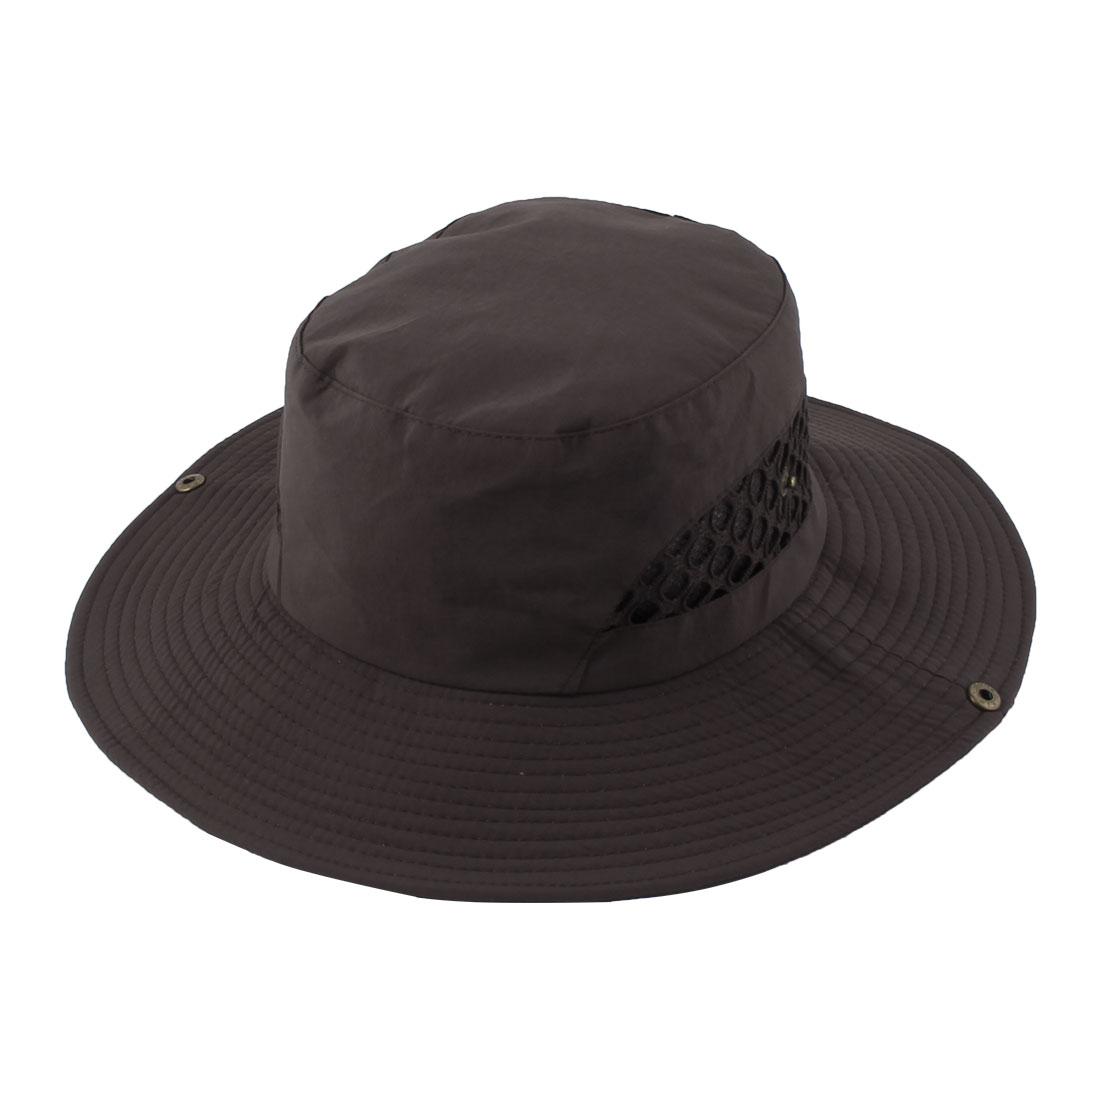 Fisherman Outdoor Fishing Hiking Travel Climbing Hunting Mesh Wide Brim Cap Headwear Sun Bucket Hat Brown